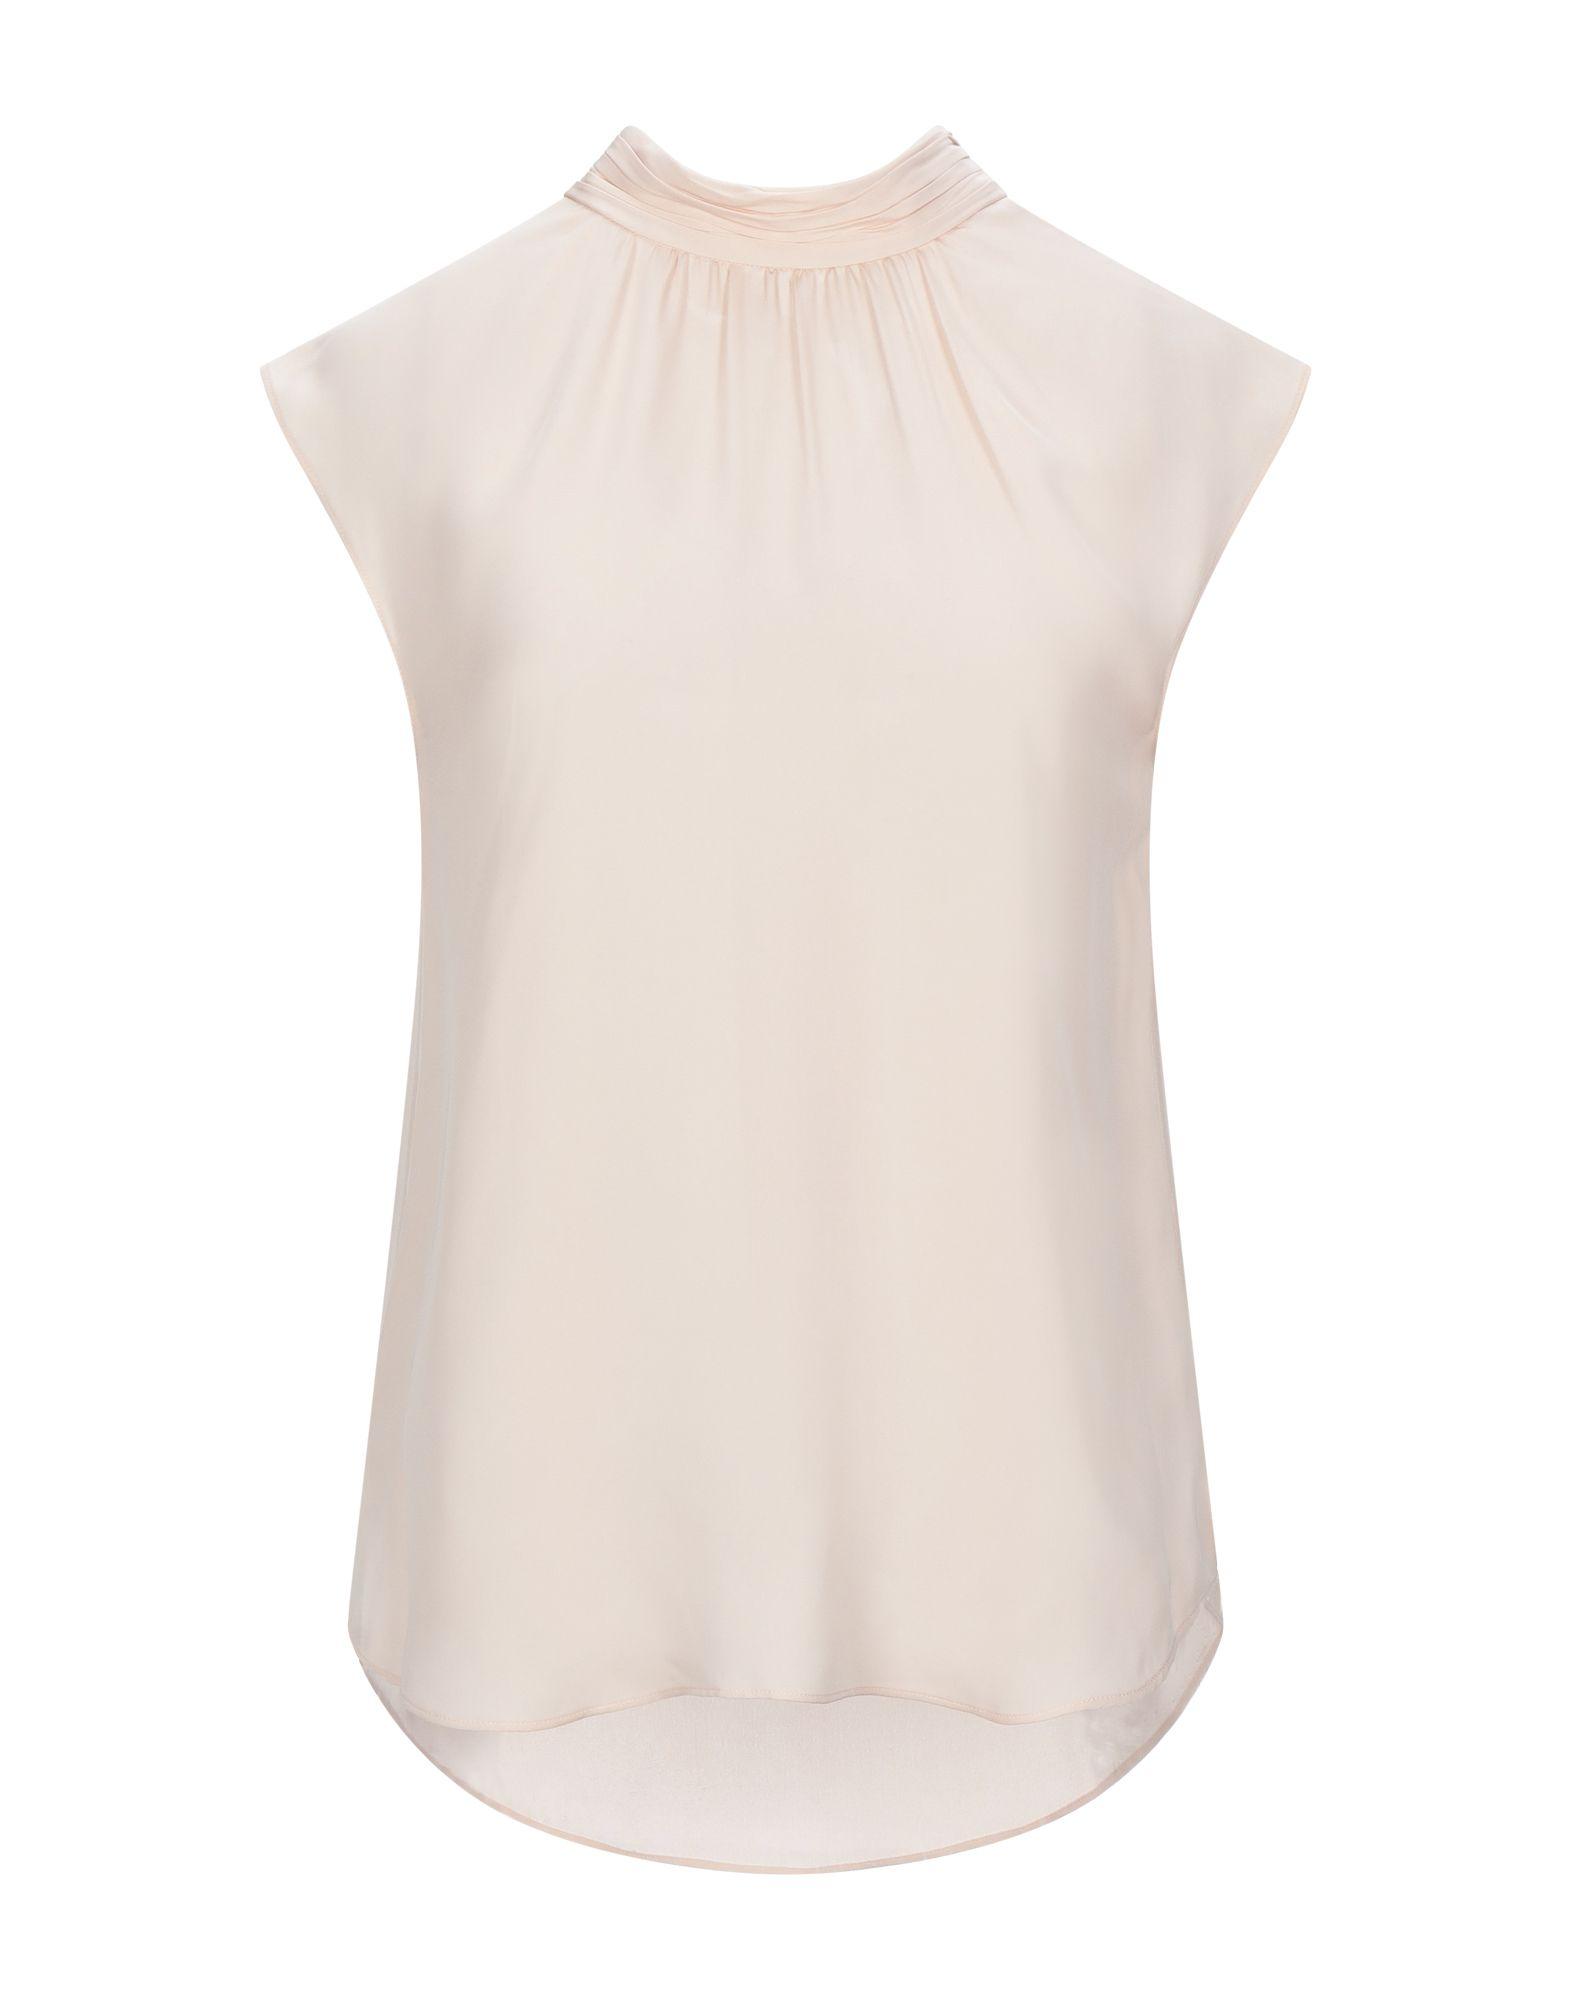 VERONICA BEARD Tops. crepe, no appliqués, basic solid color, round collar, sleeveless, no pockets, rear closure. 100% Silk